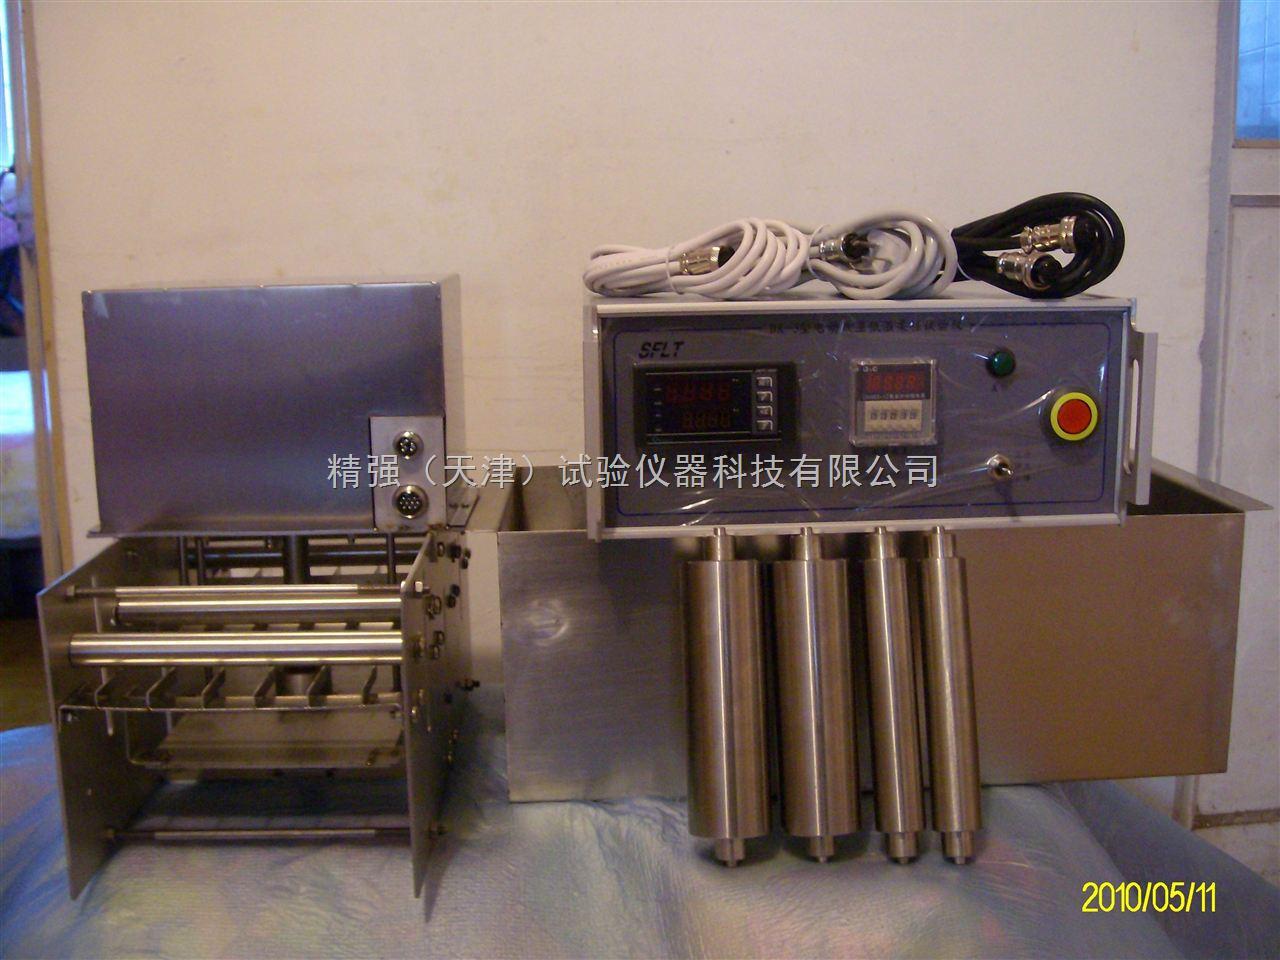 DR-3-弯板或柔度仪